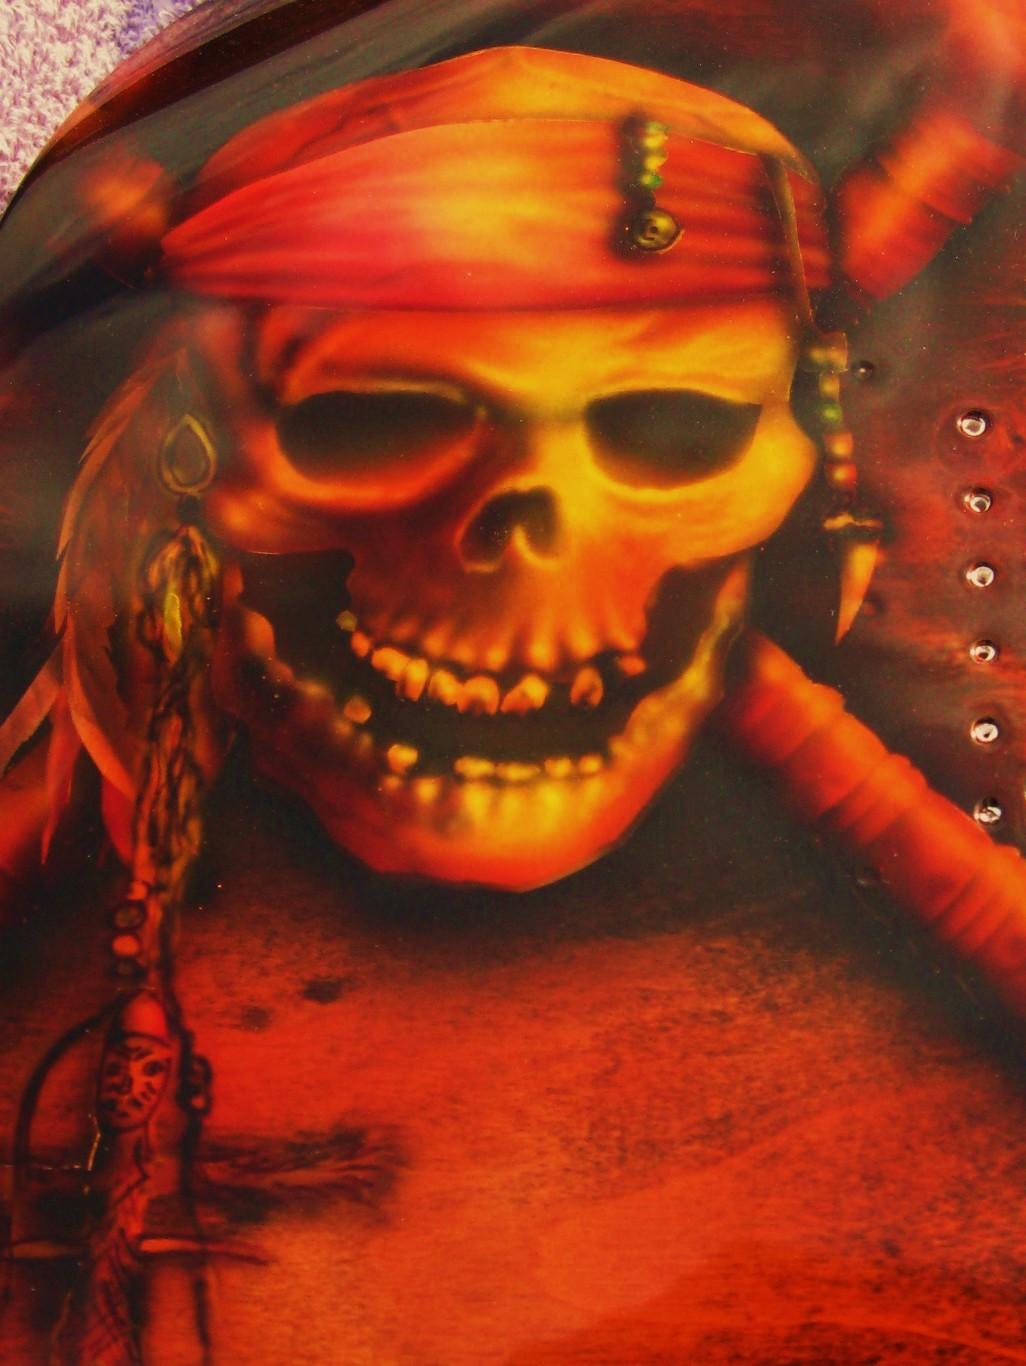 Guitar-Greg-Cassell-Ibanez-Pirate-Skull-crossbones-jolly-roger- (2)